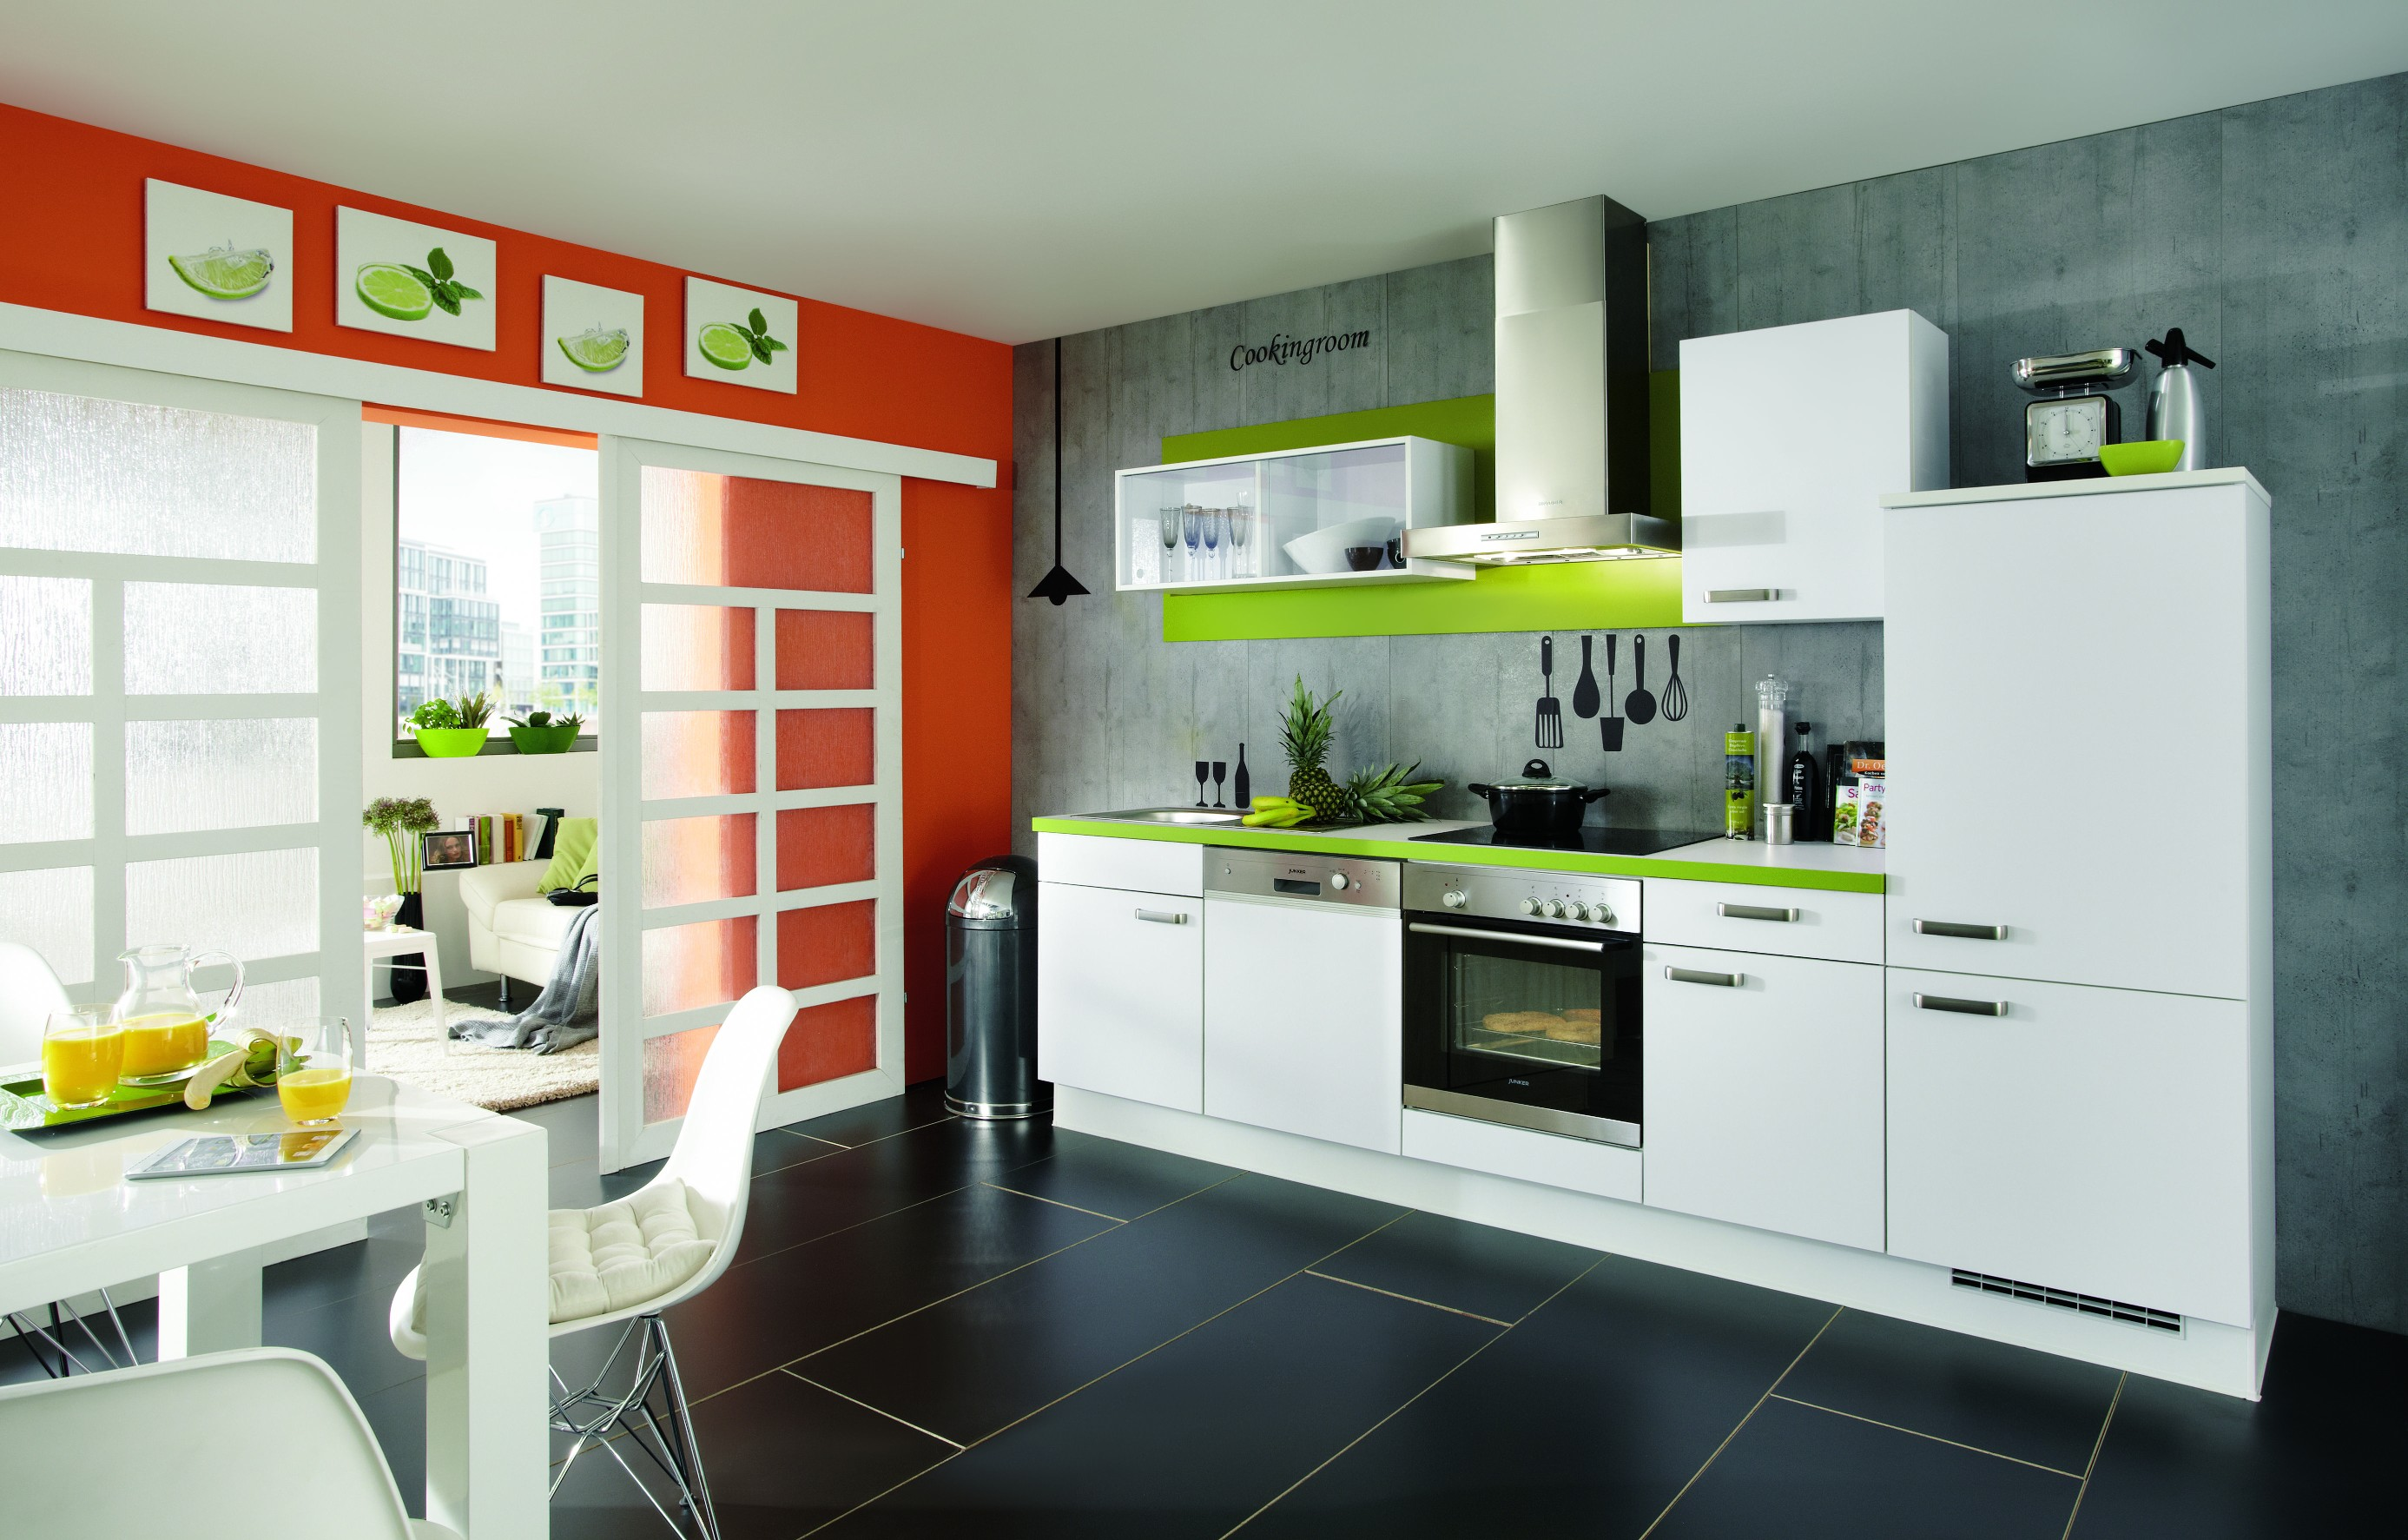 Design Kleine Keuken : Kleine keuken keukens bodegraven